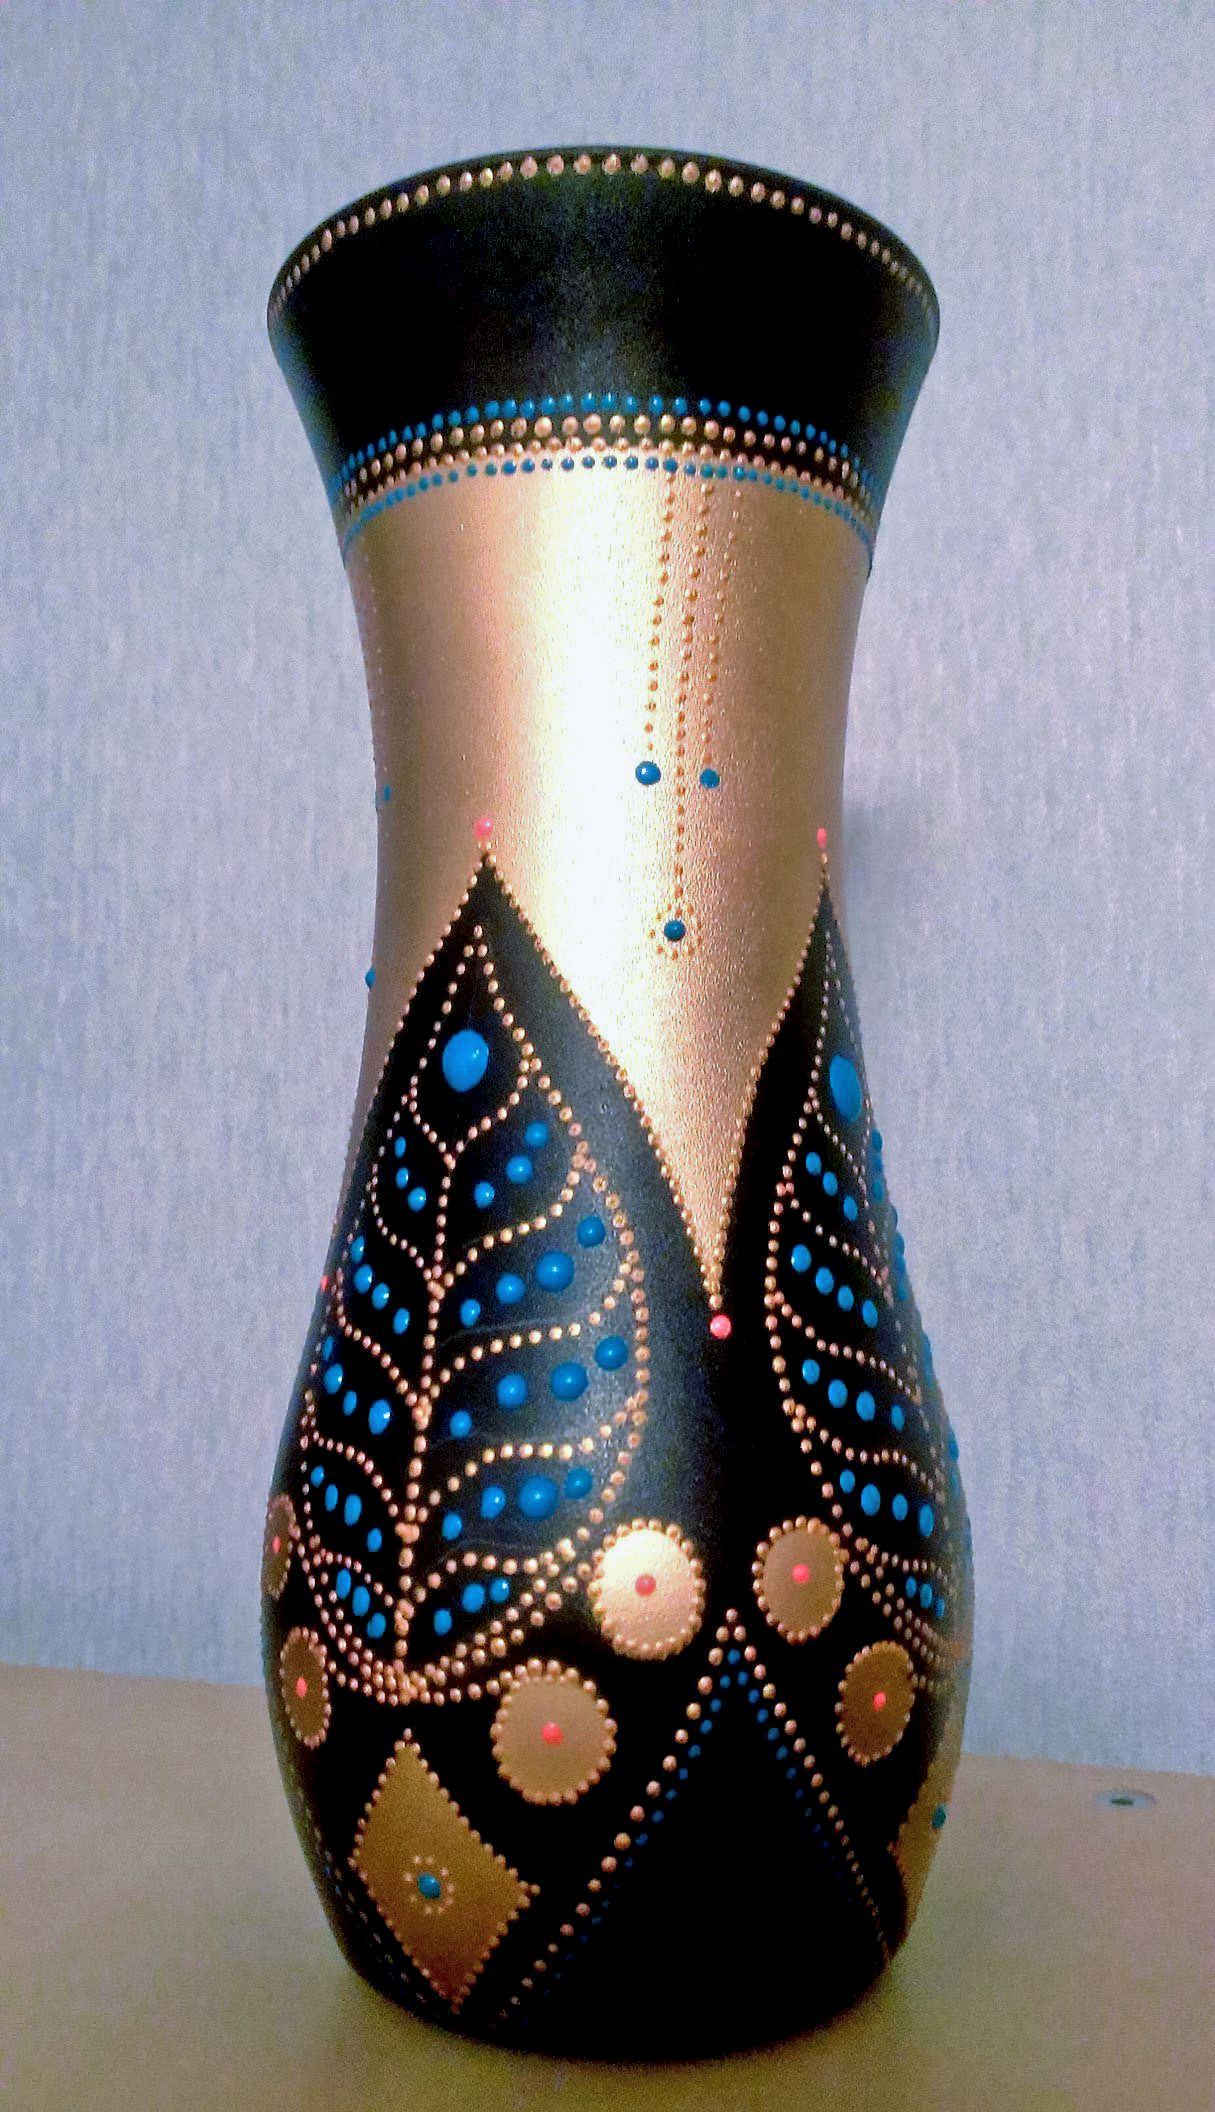 цветы декоративнаяваза медовыйсад узоры handmade ваза точечнаяроспись декор подарок ручнаяработа